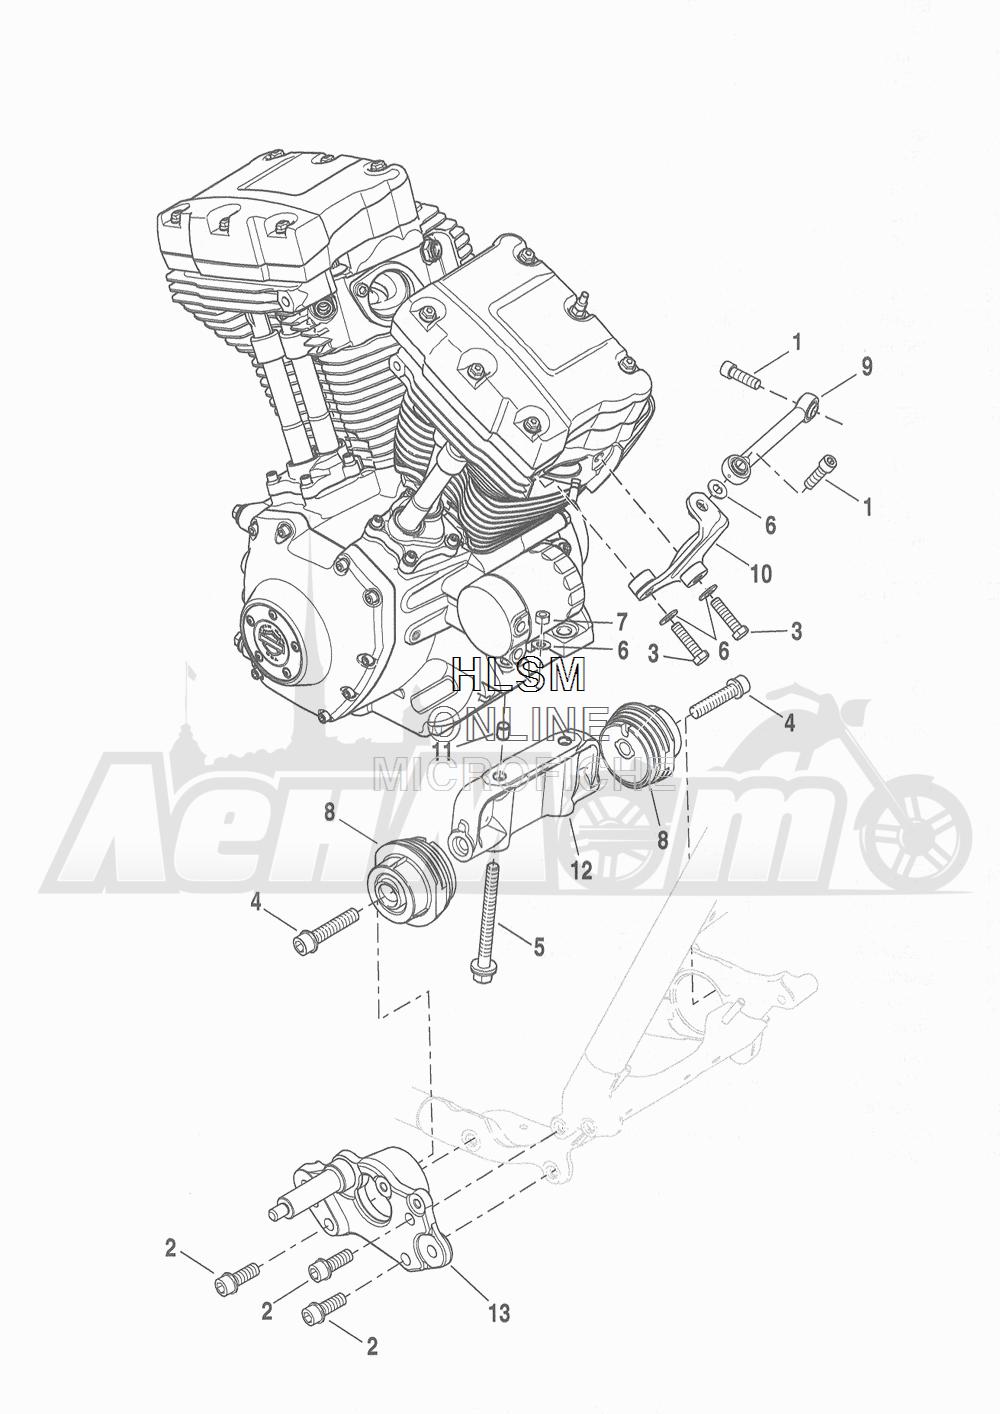 Запчасти для Мотоцикла Harley-Davidson 2016 FLHR ROAD KING (FBM) Раздел: ENGINE MOUNTS W/ STABILIZER LINK | опоры двигателя вместе с стабилизатор